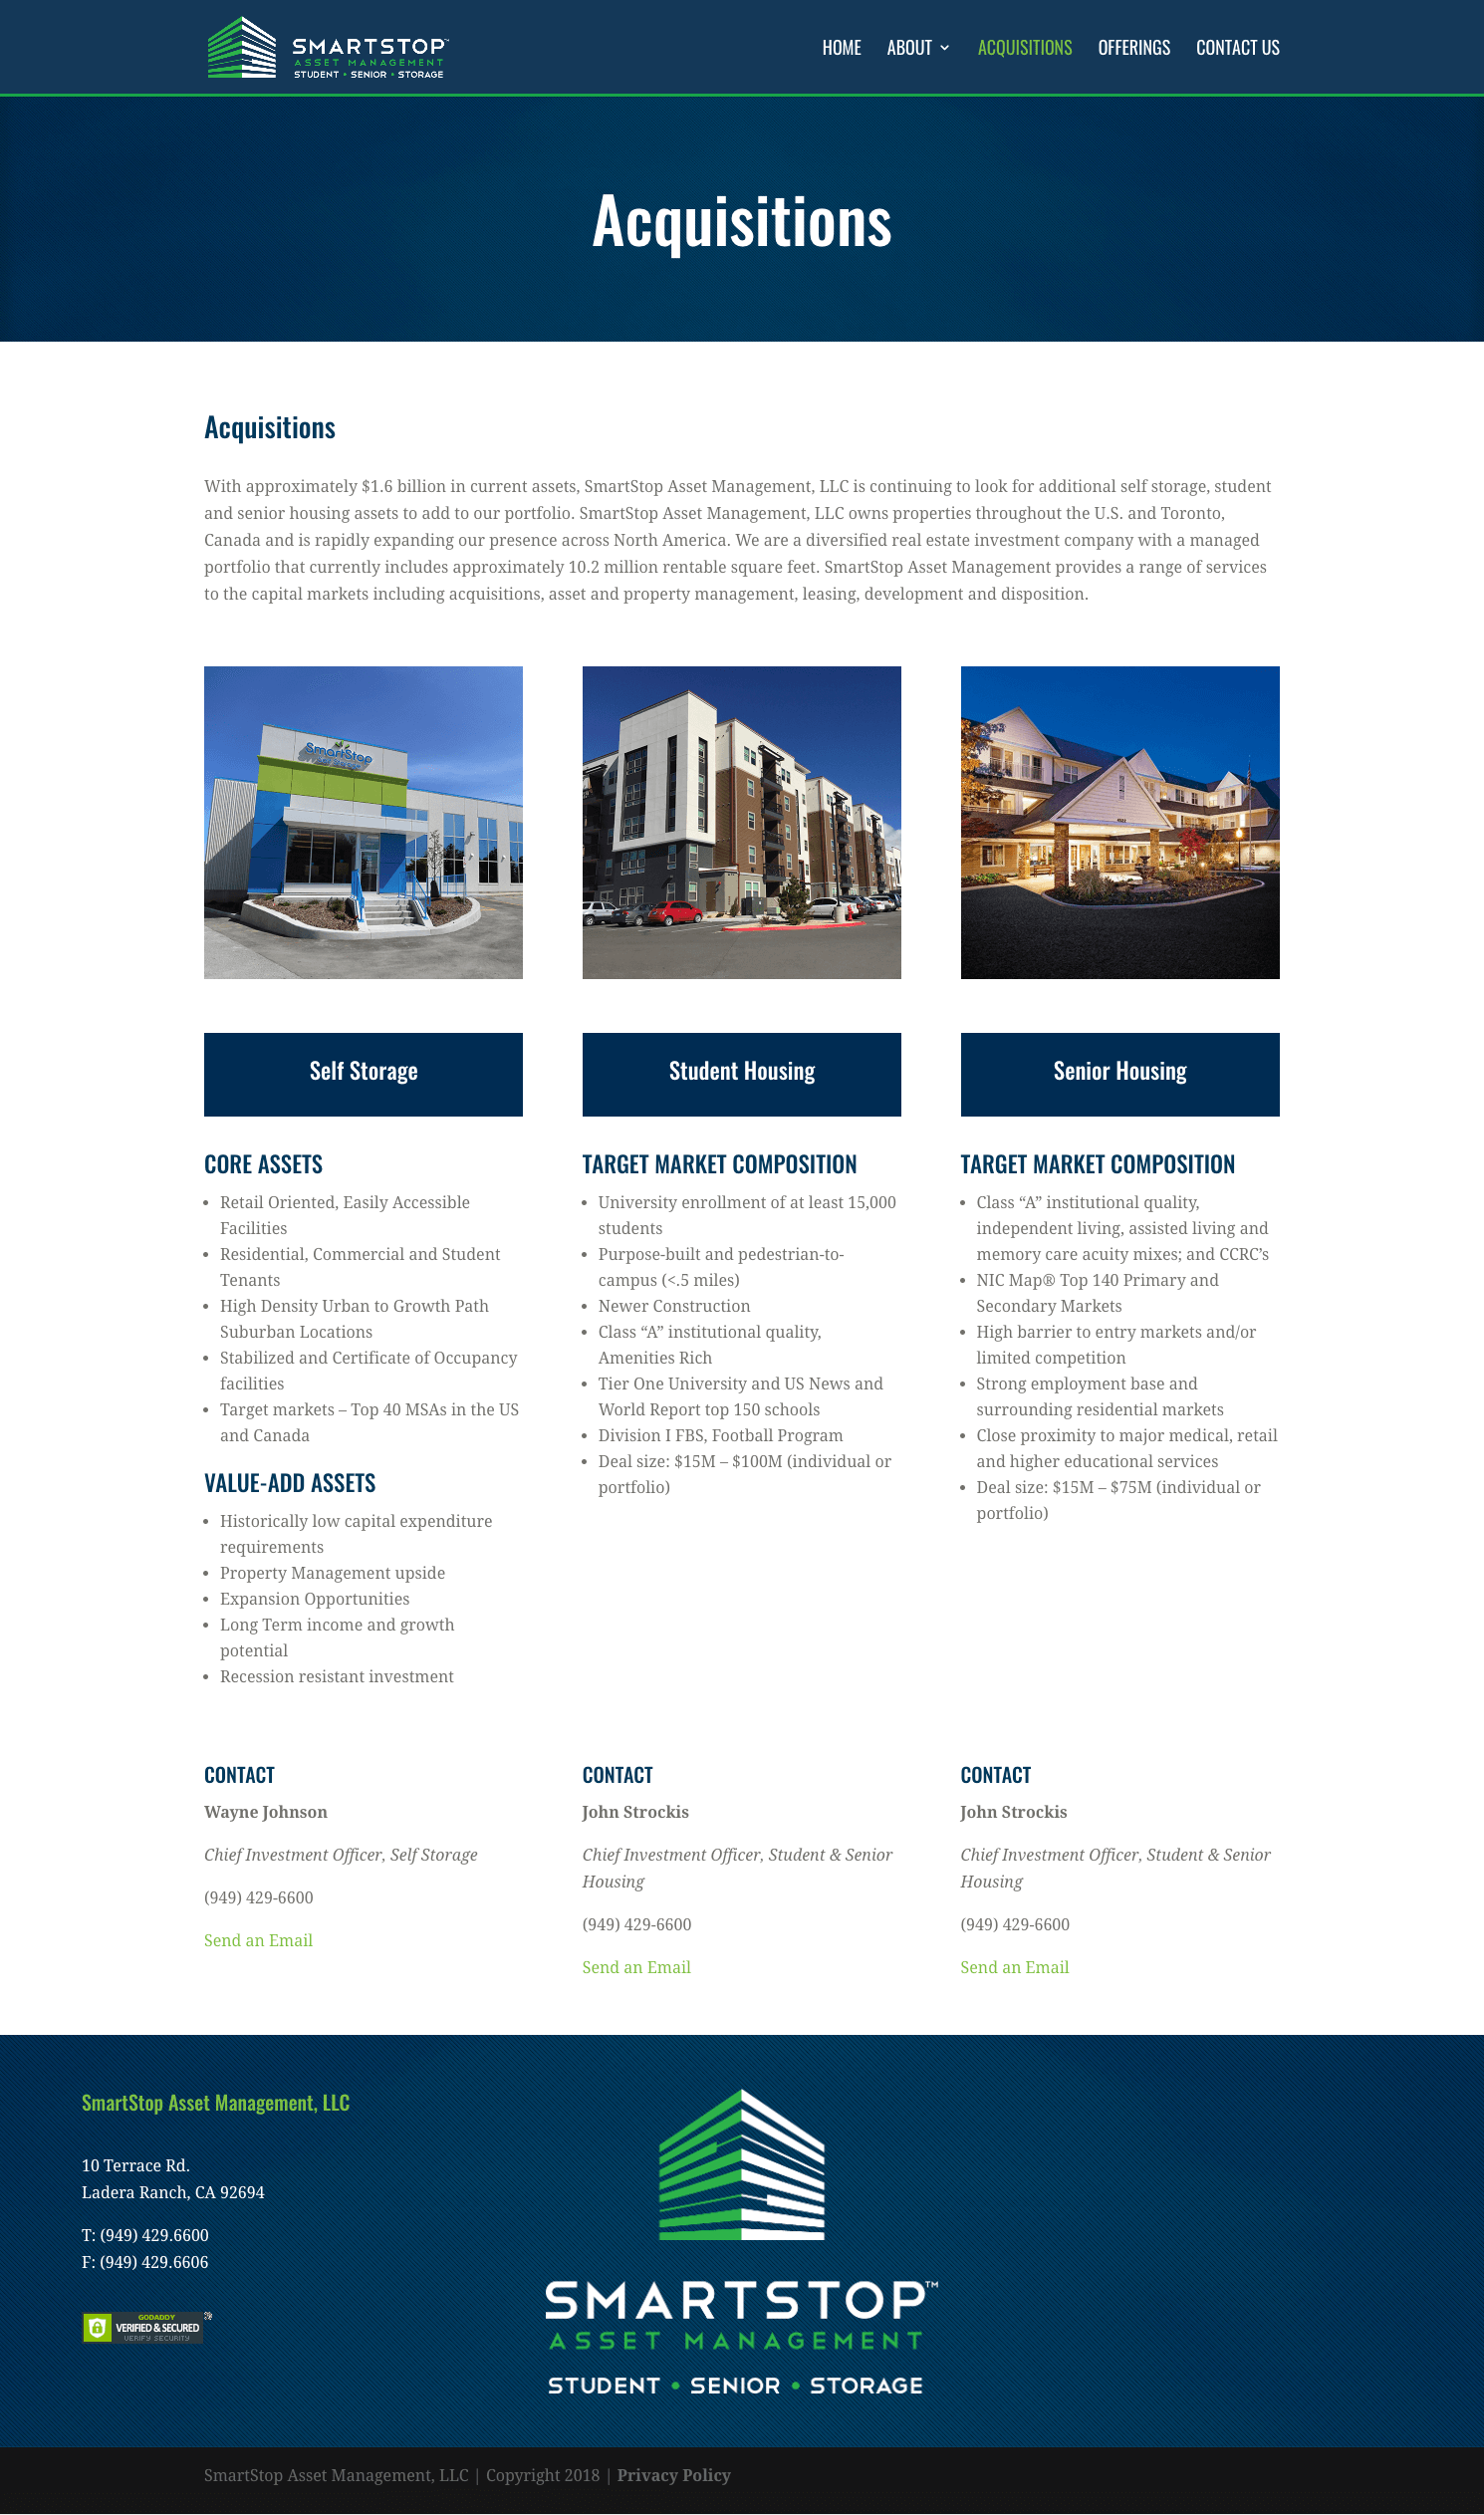 SmartStop-Asset-Management-Real-Estate-Investment-Trust-REIT-1031-Exchanges-Website-Design-Acquisitions-Page